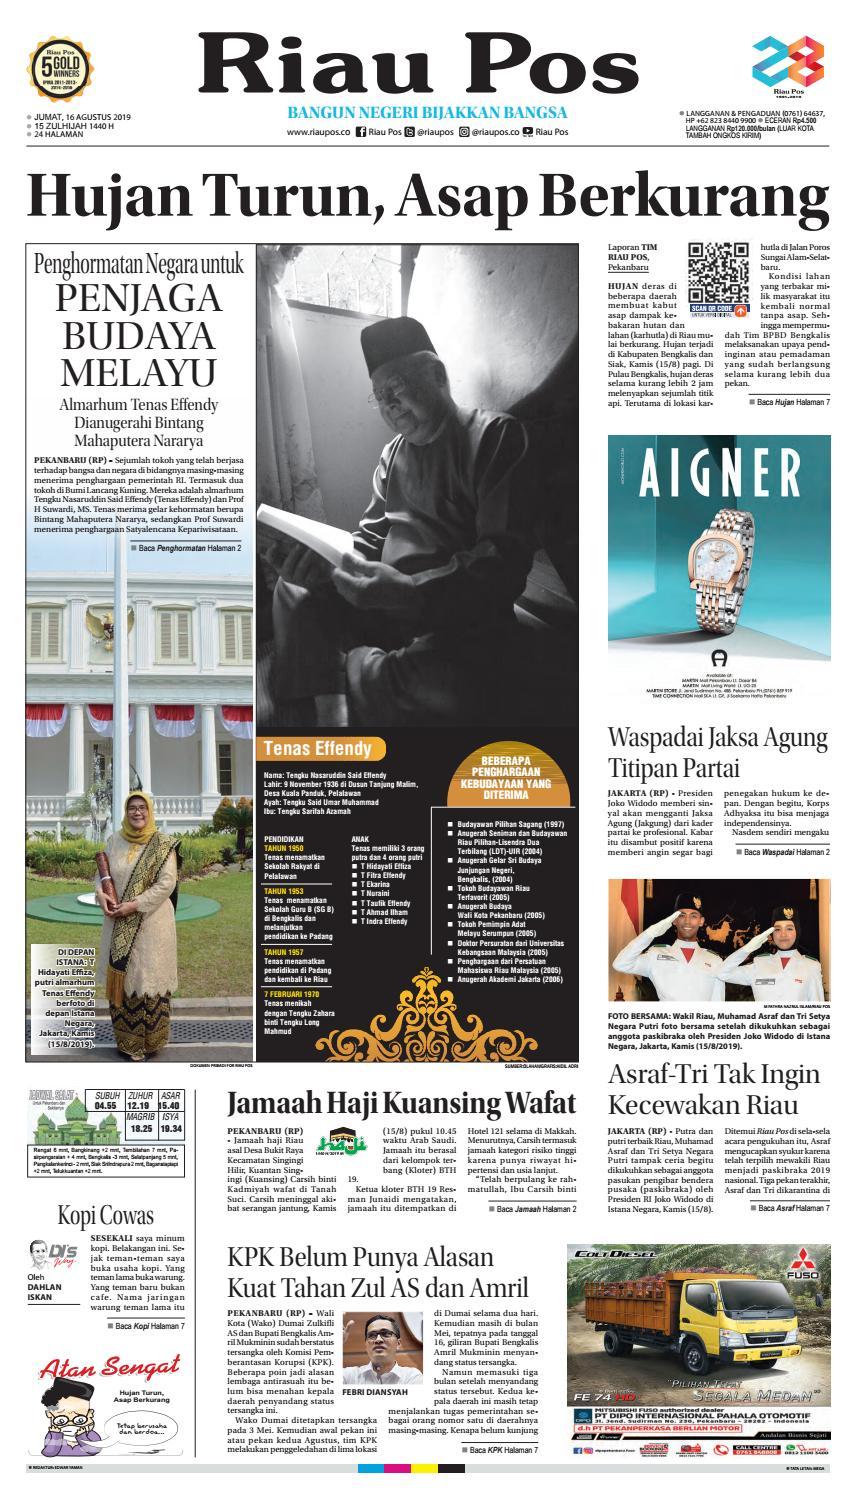 Riau Pos Edisi Jum At 16 Agustus 2019 By Riau Pos Issuu